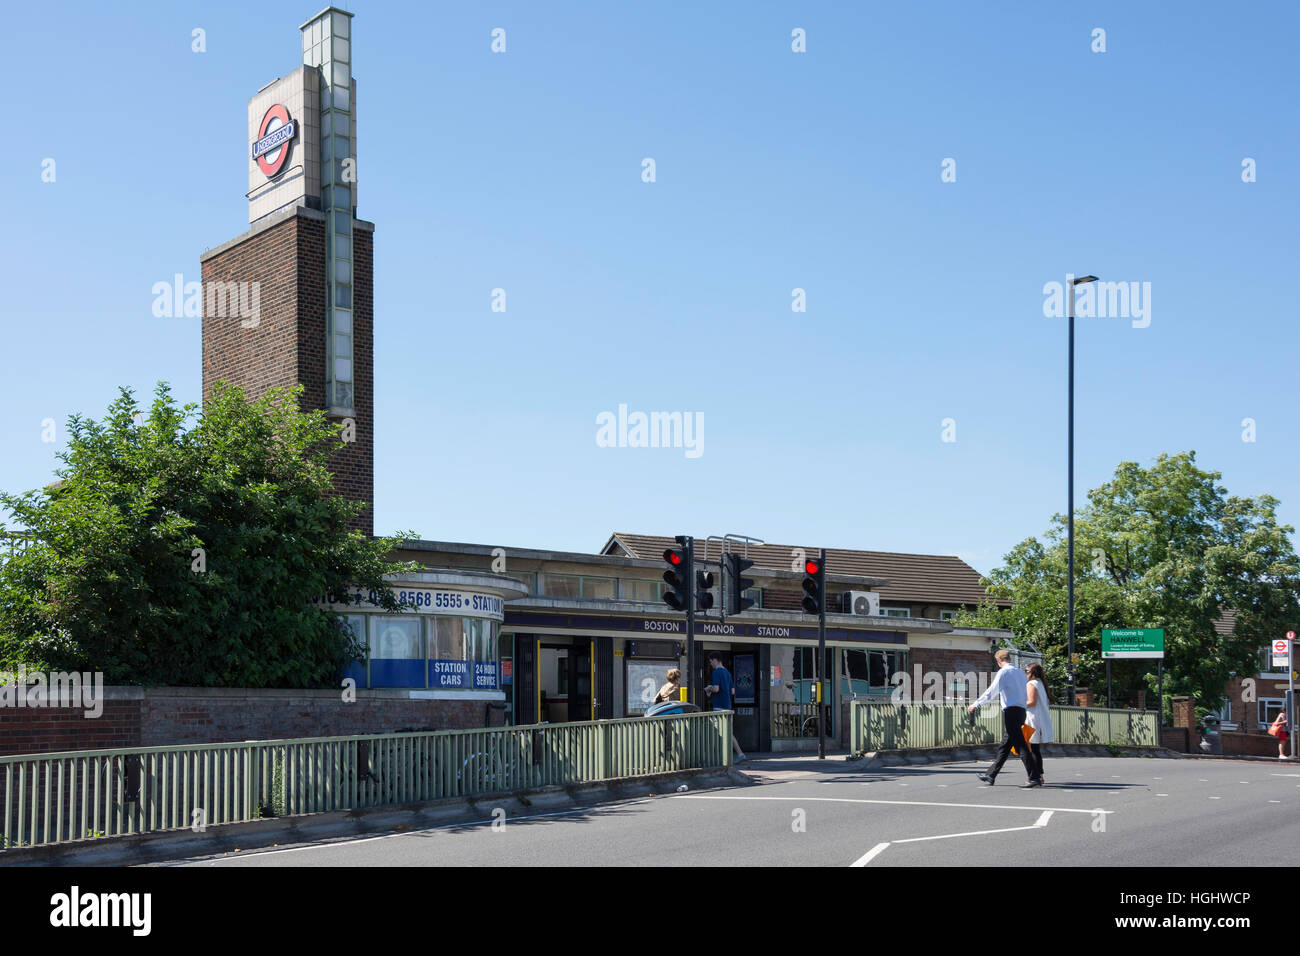 La estación de metro Boston Manor, Brentford, Hounslow, London Borough of Greater London, England, Reino Unido Imagen De Stock